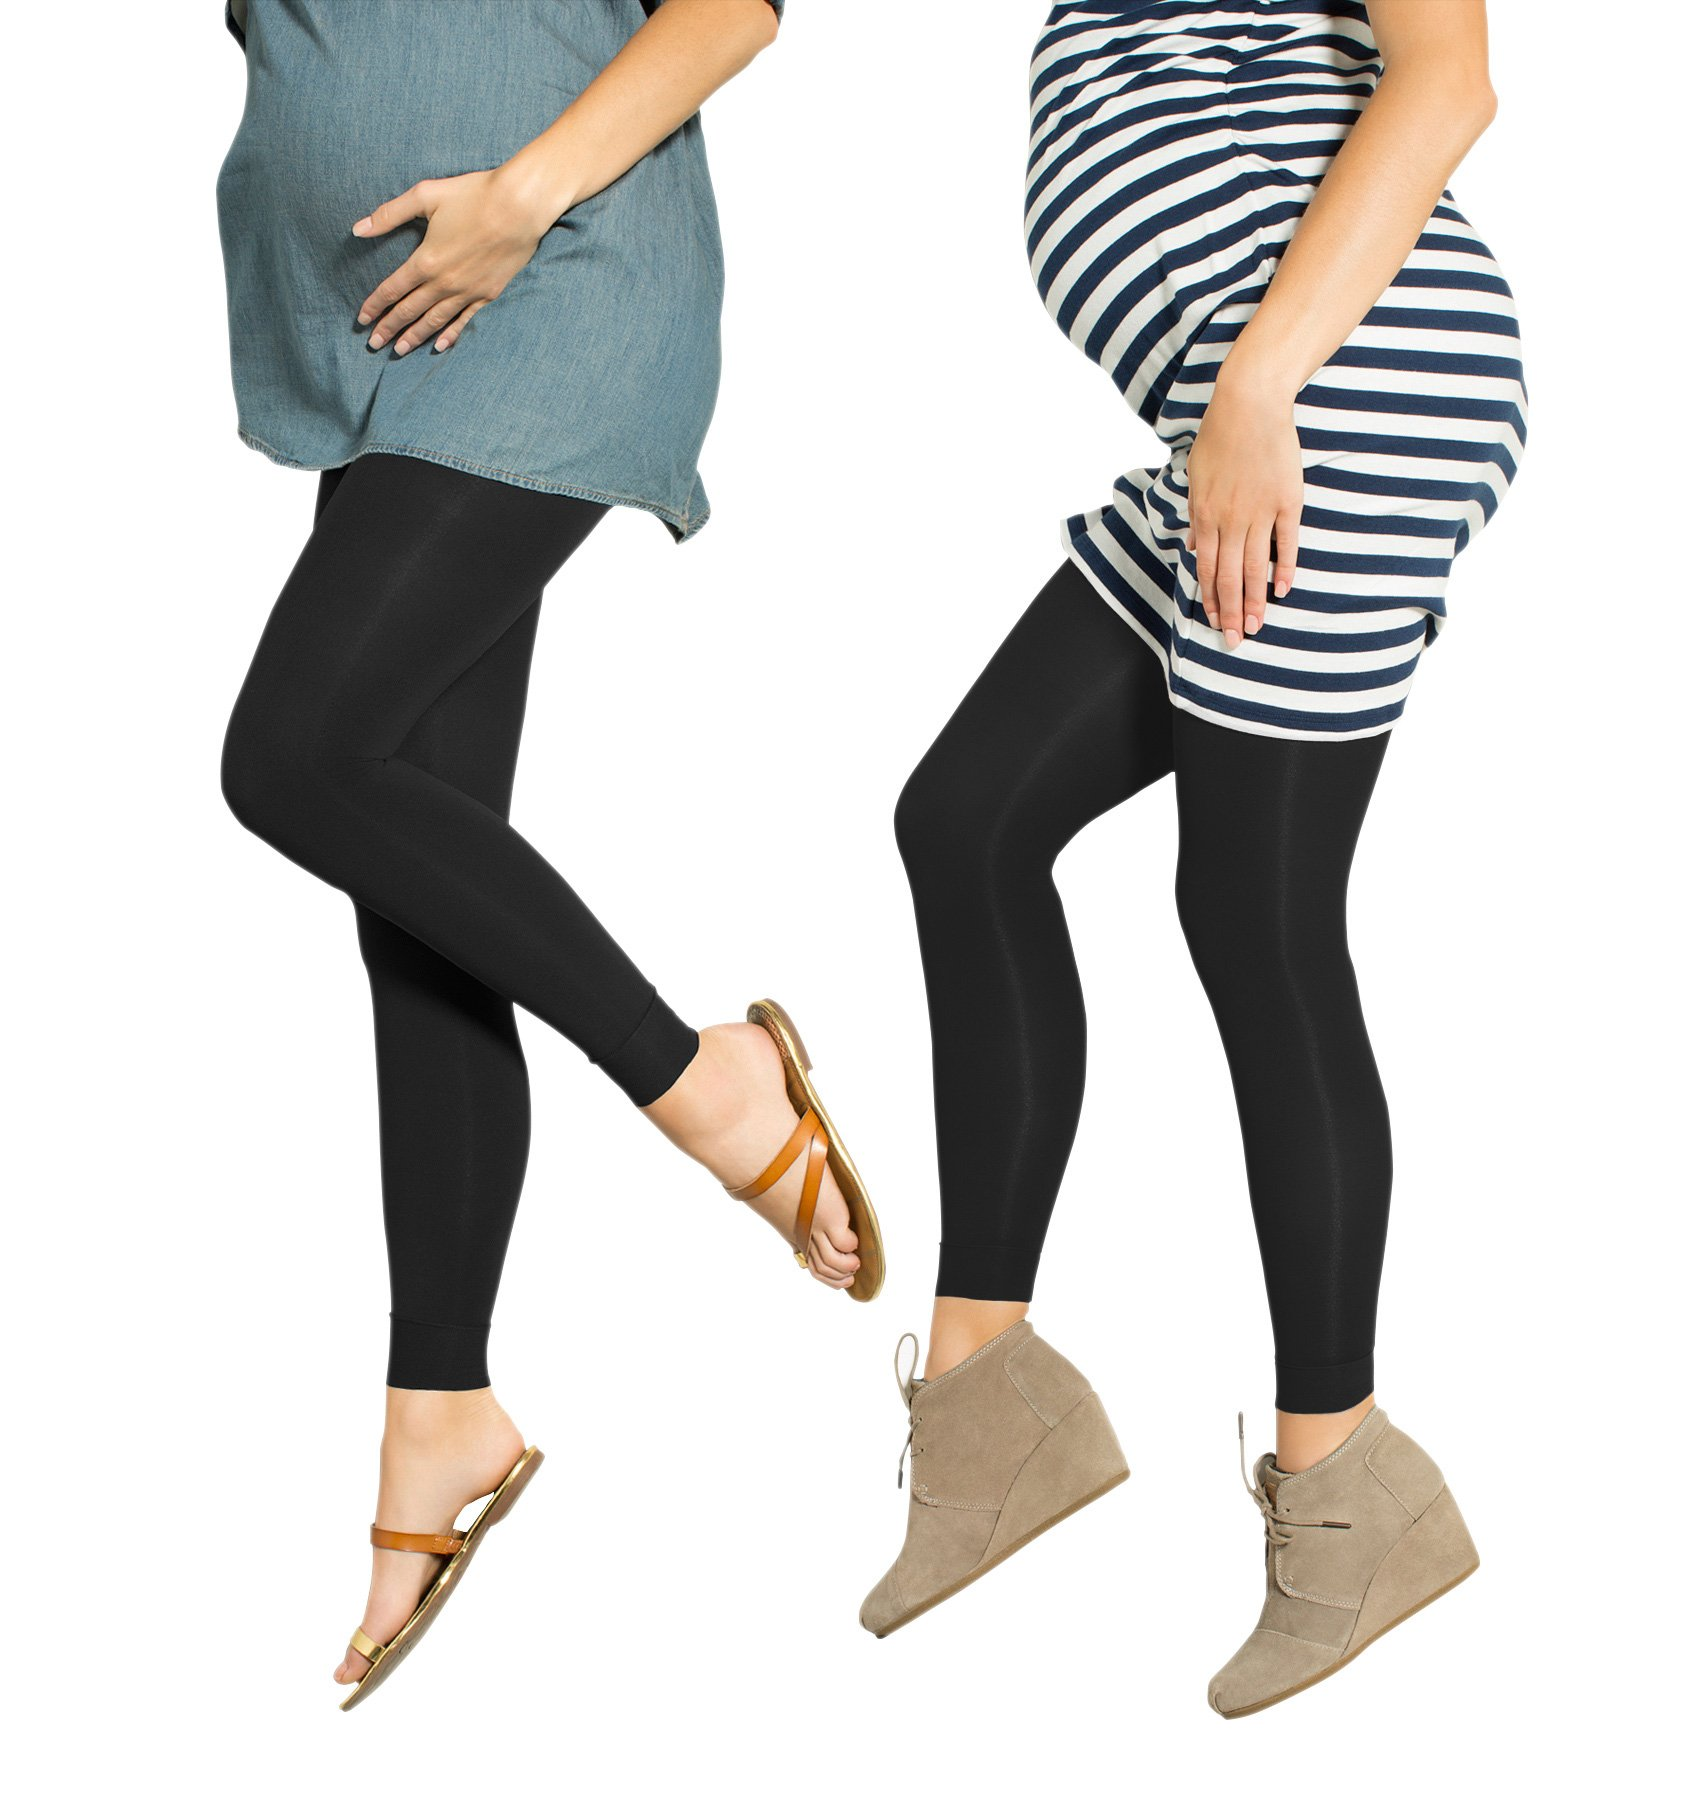 Preggers 2 Pack 10-15mmhg Footless Maternity Compression Leggings (Black, SM)